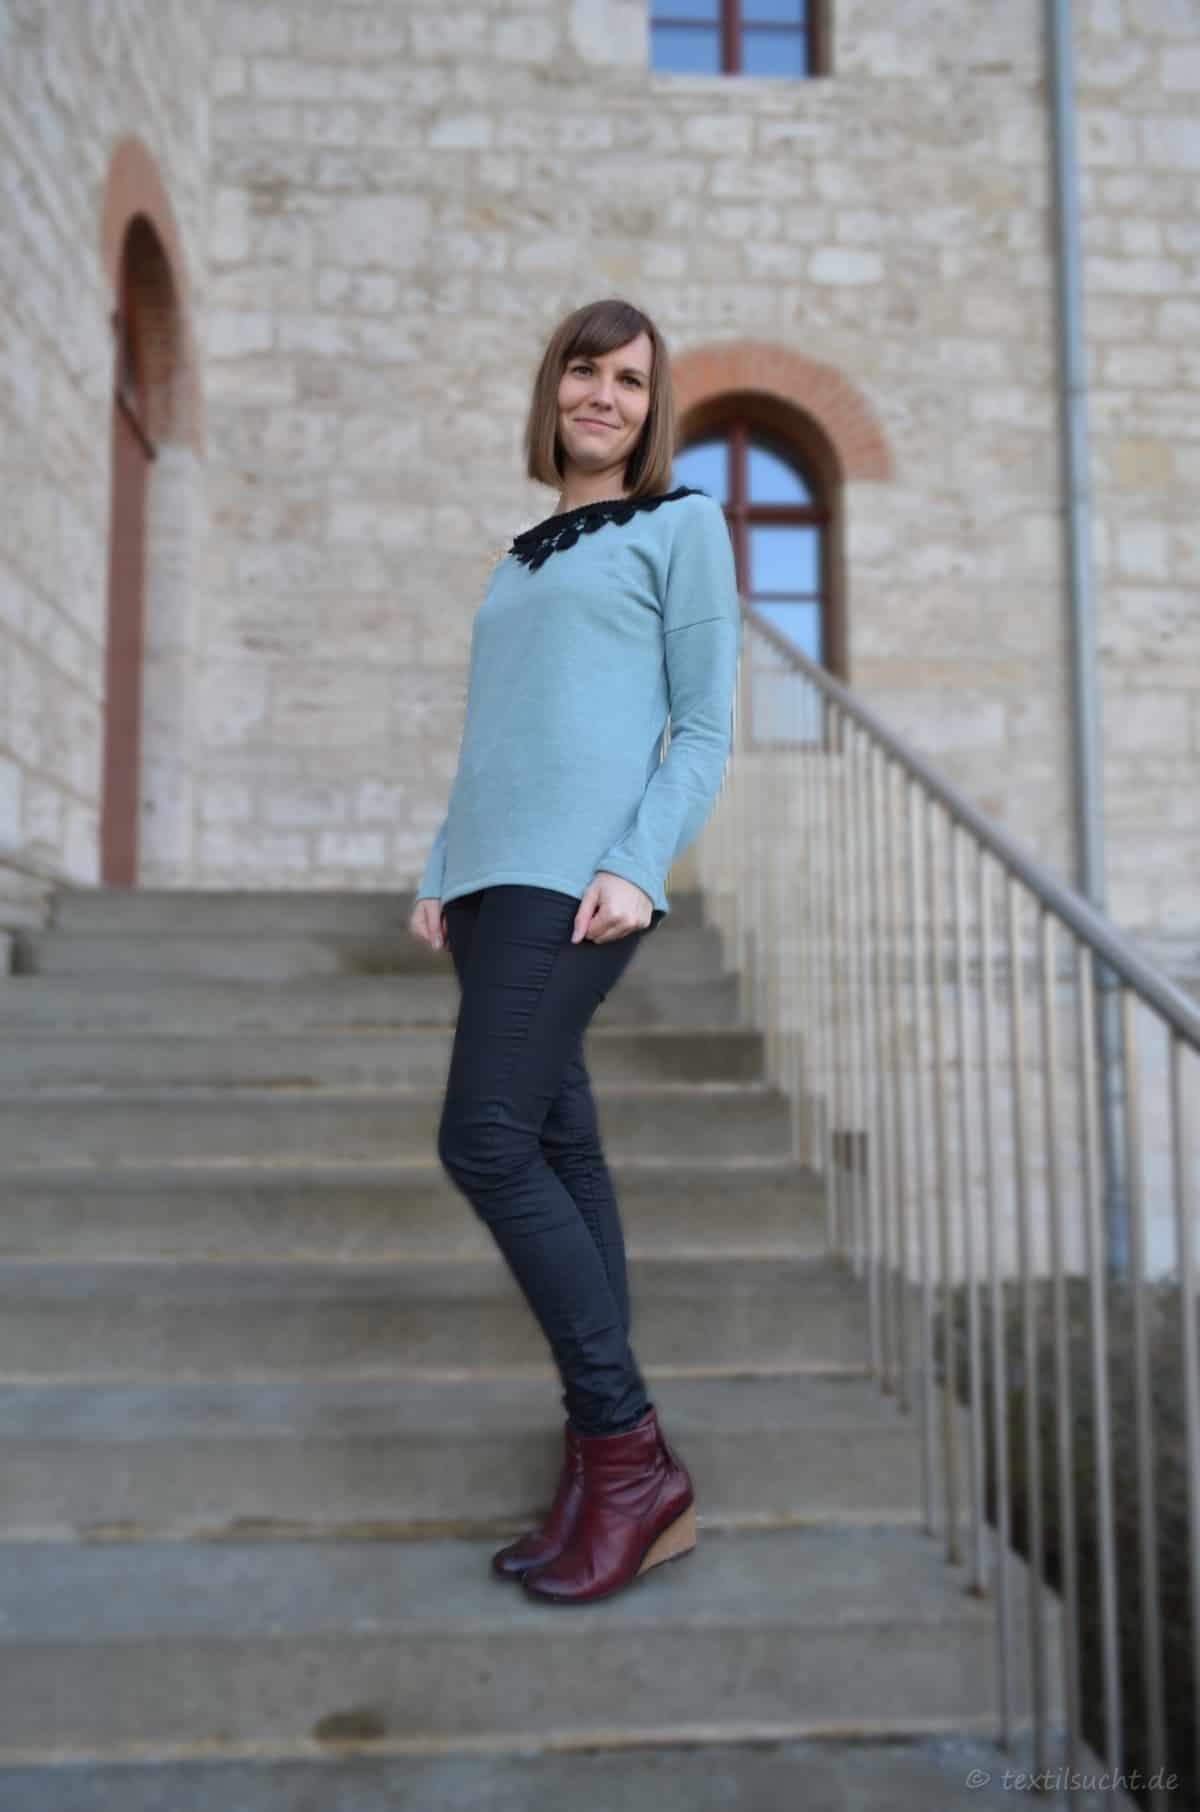 Schnittmuster Damenshirt Amylee mit Spitzenkragen | textilsucht.de